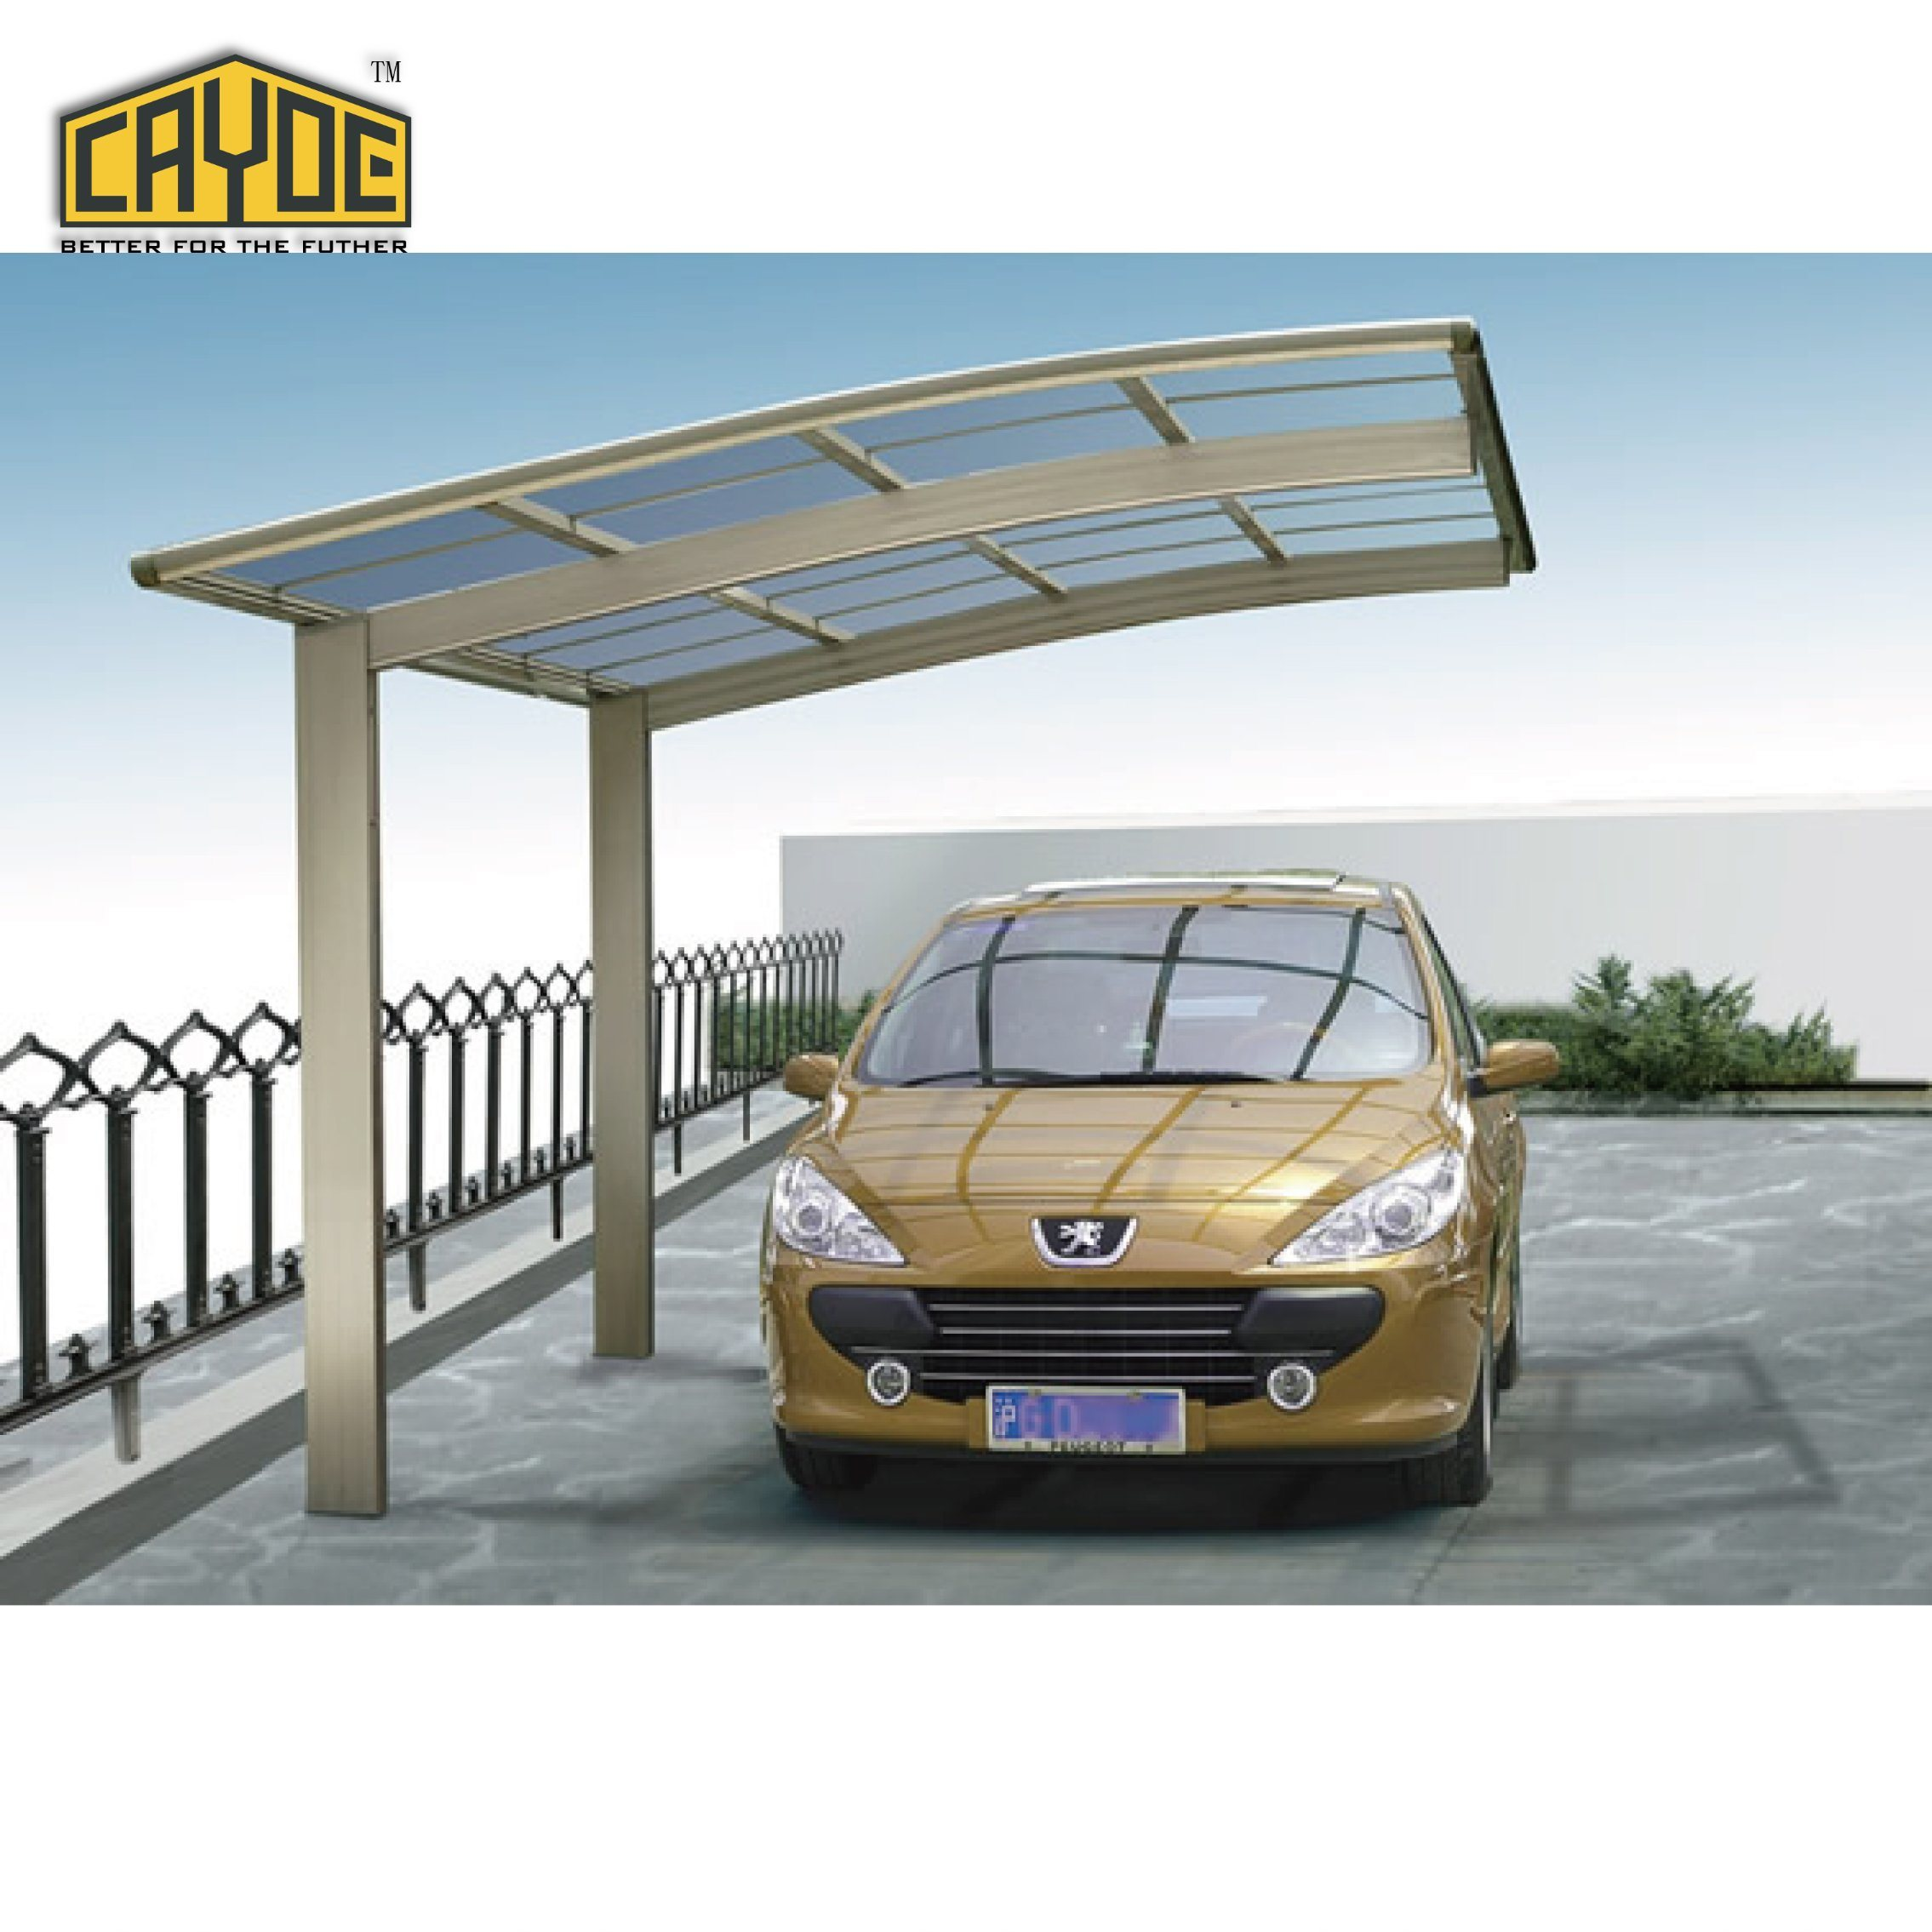 China Car Shed Roof Pergola Car Parking Shed China Carport Aluminum Carport